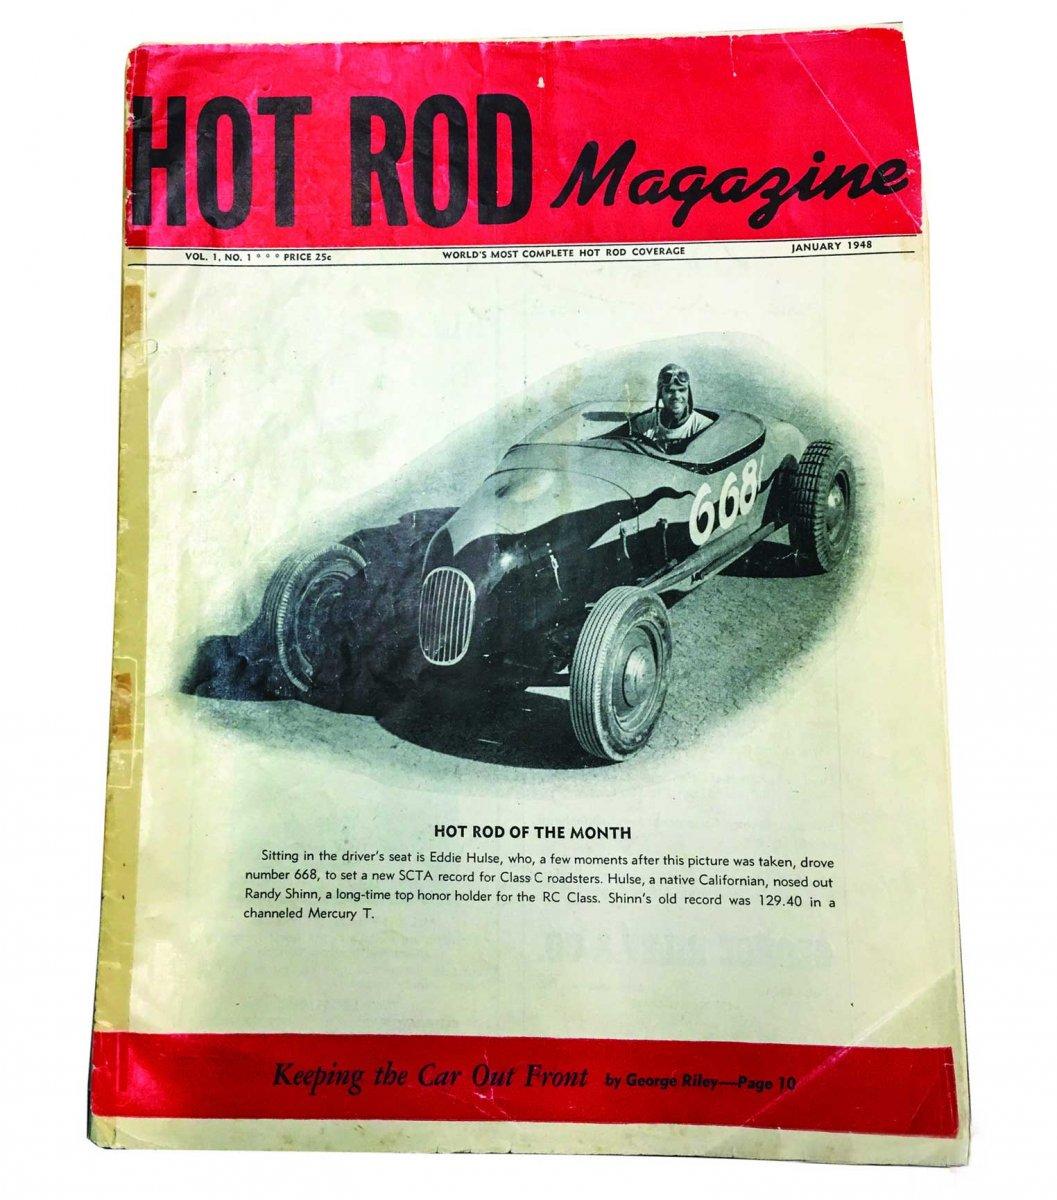 hot-rod-magazine-issue-1-1.jpg